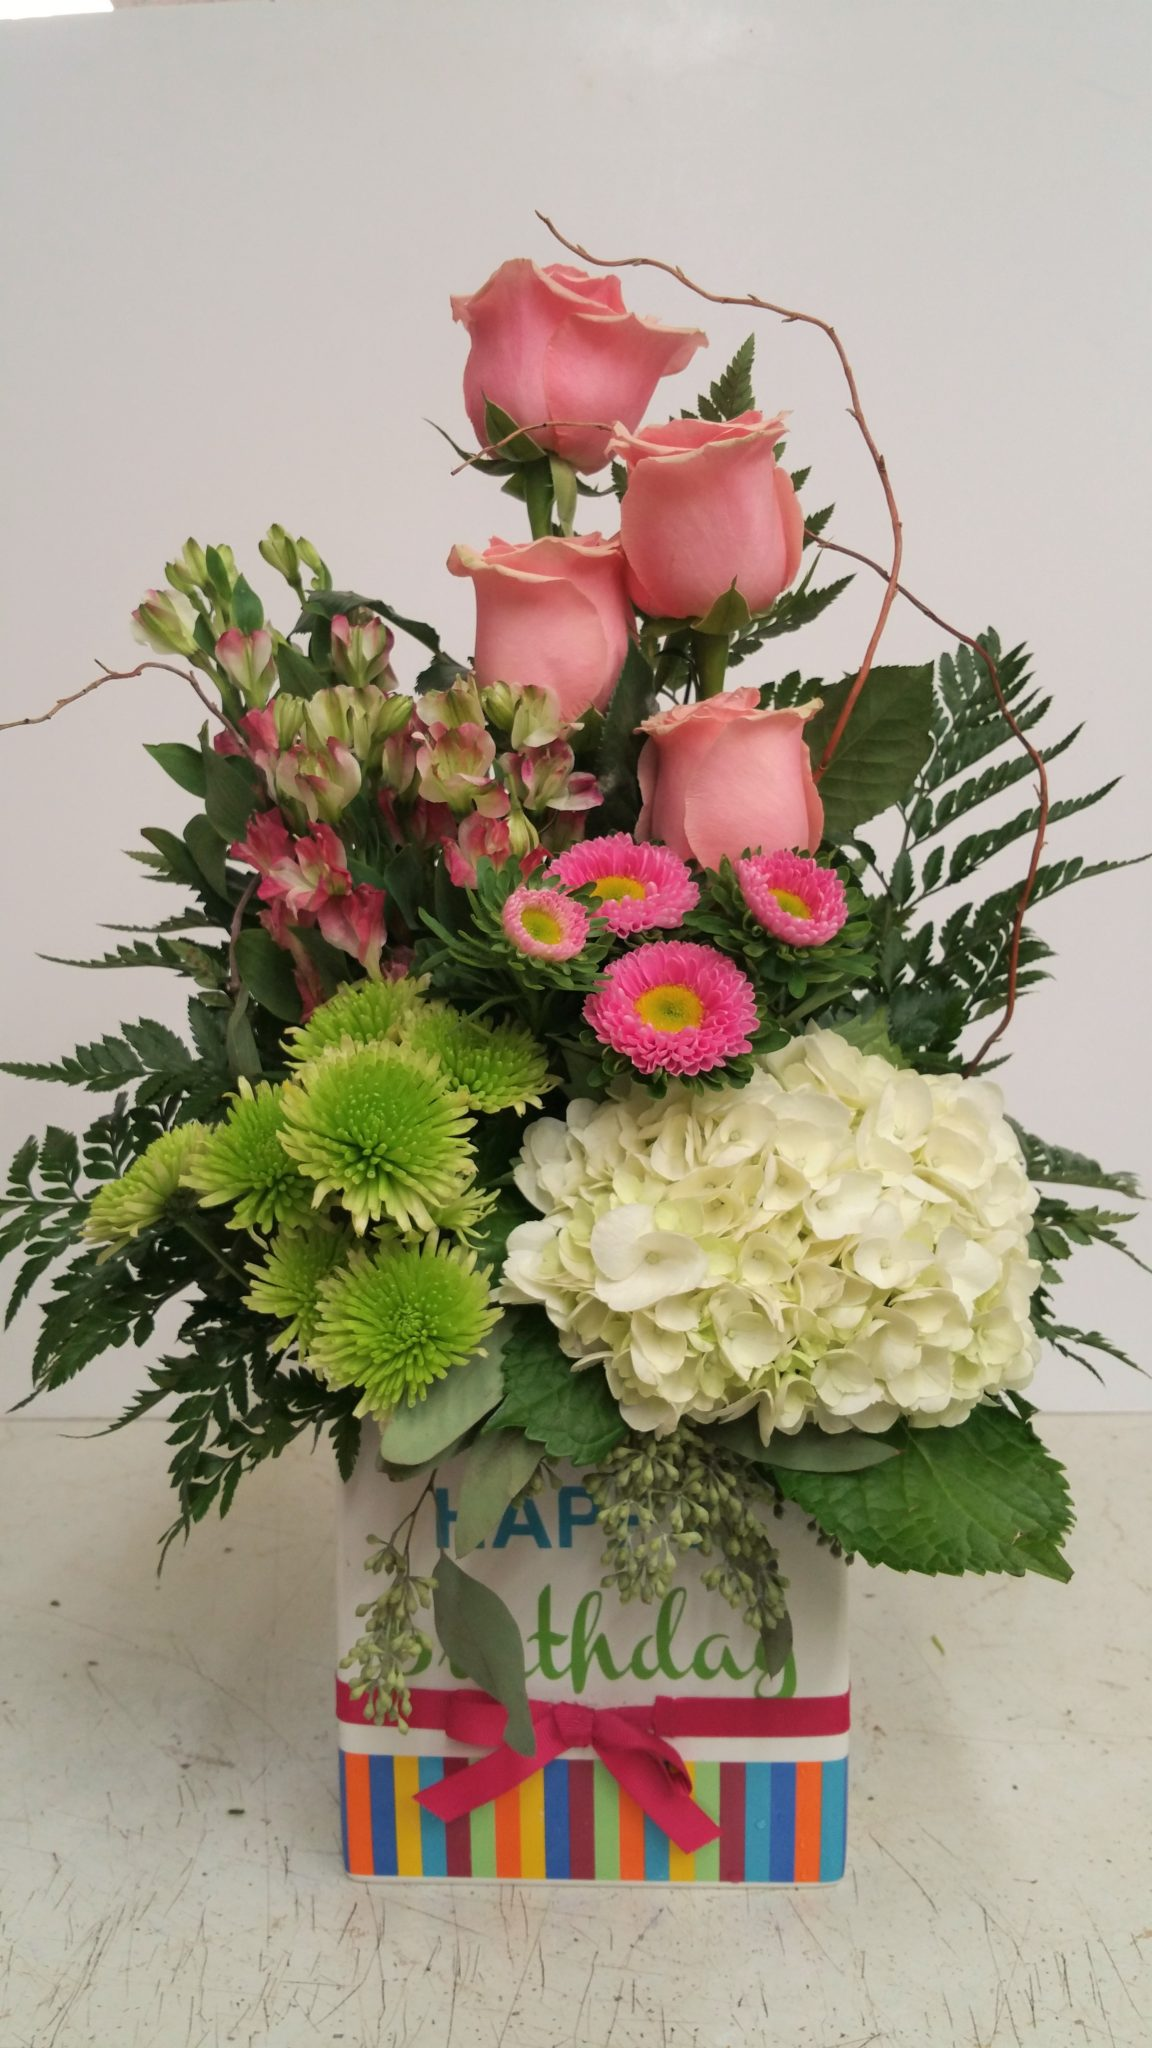 The best birthday ever 60 7499 birthday birthday bouquets the best birthday ever izmirmasajfo